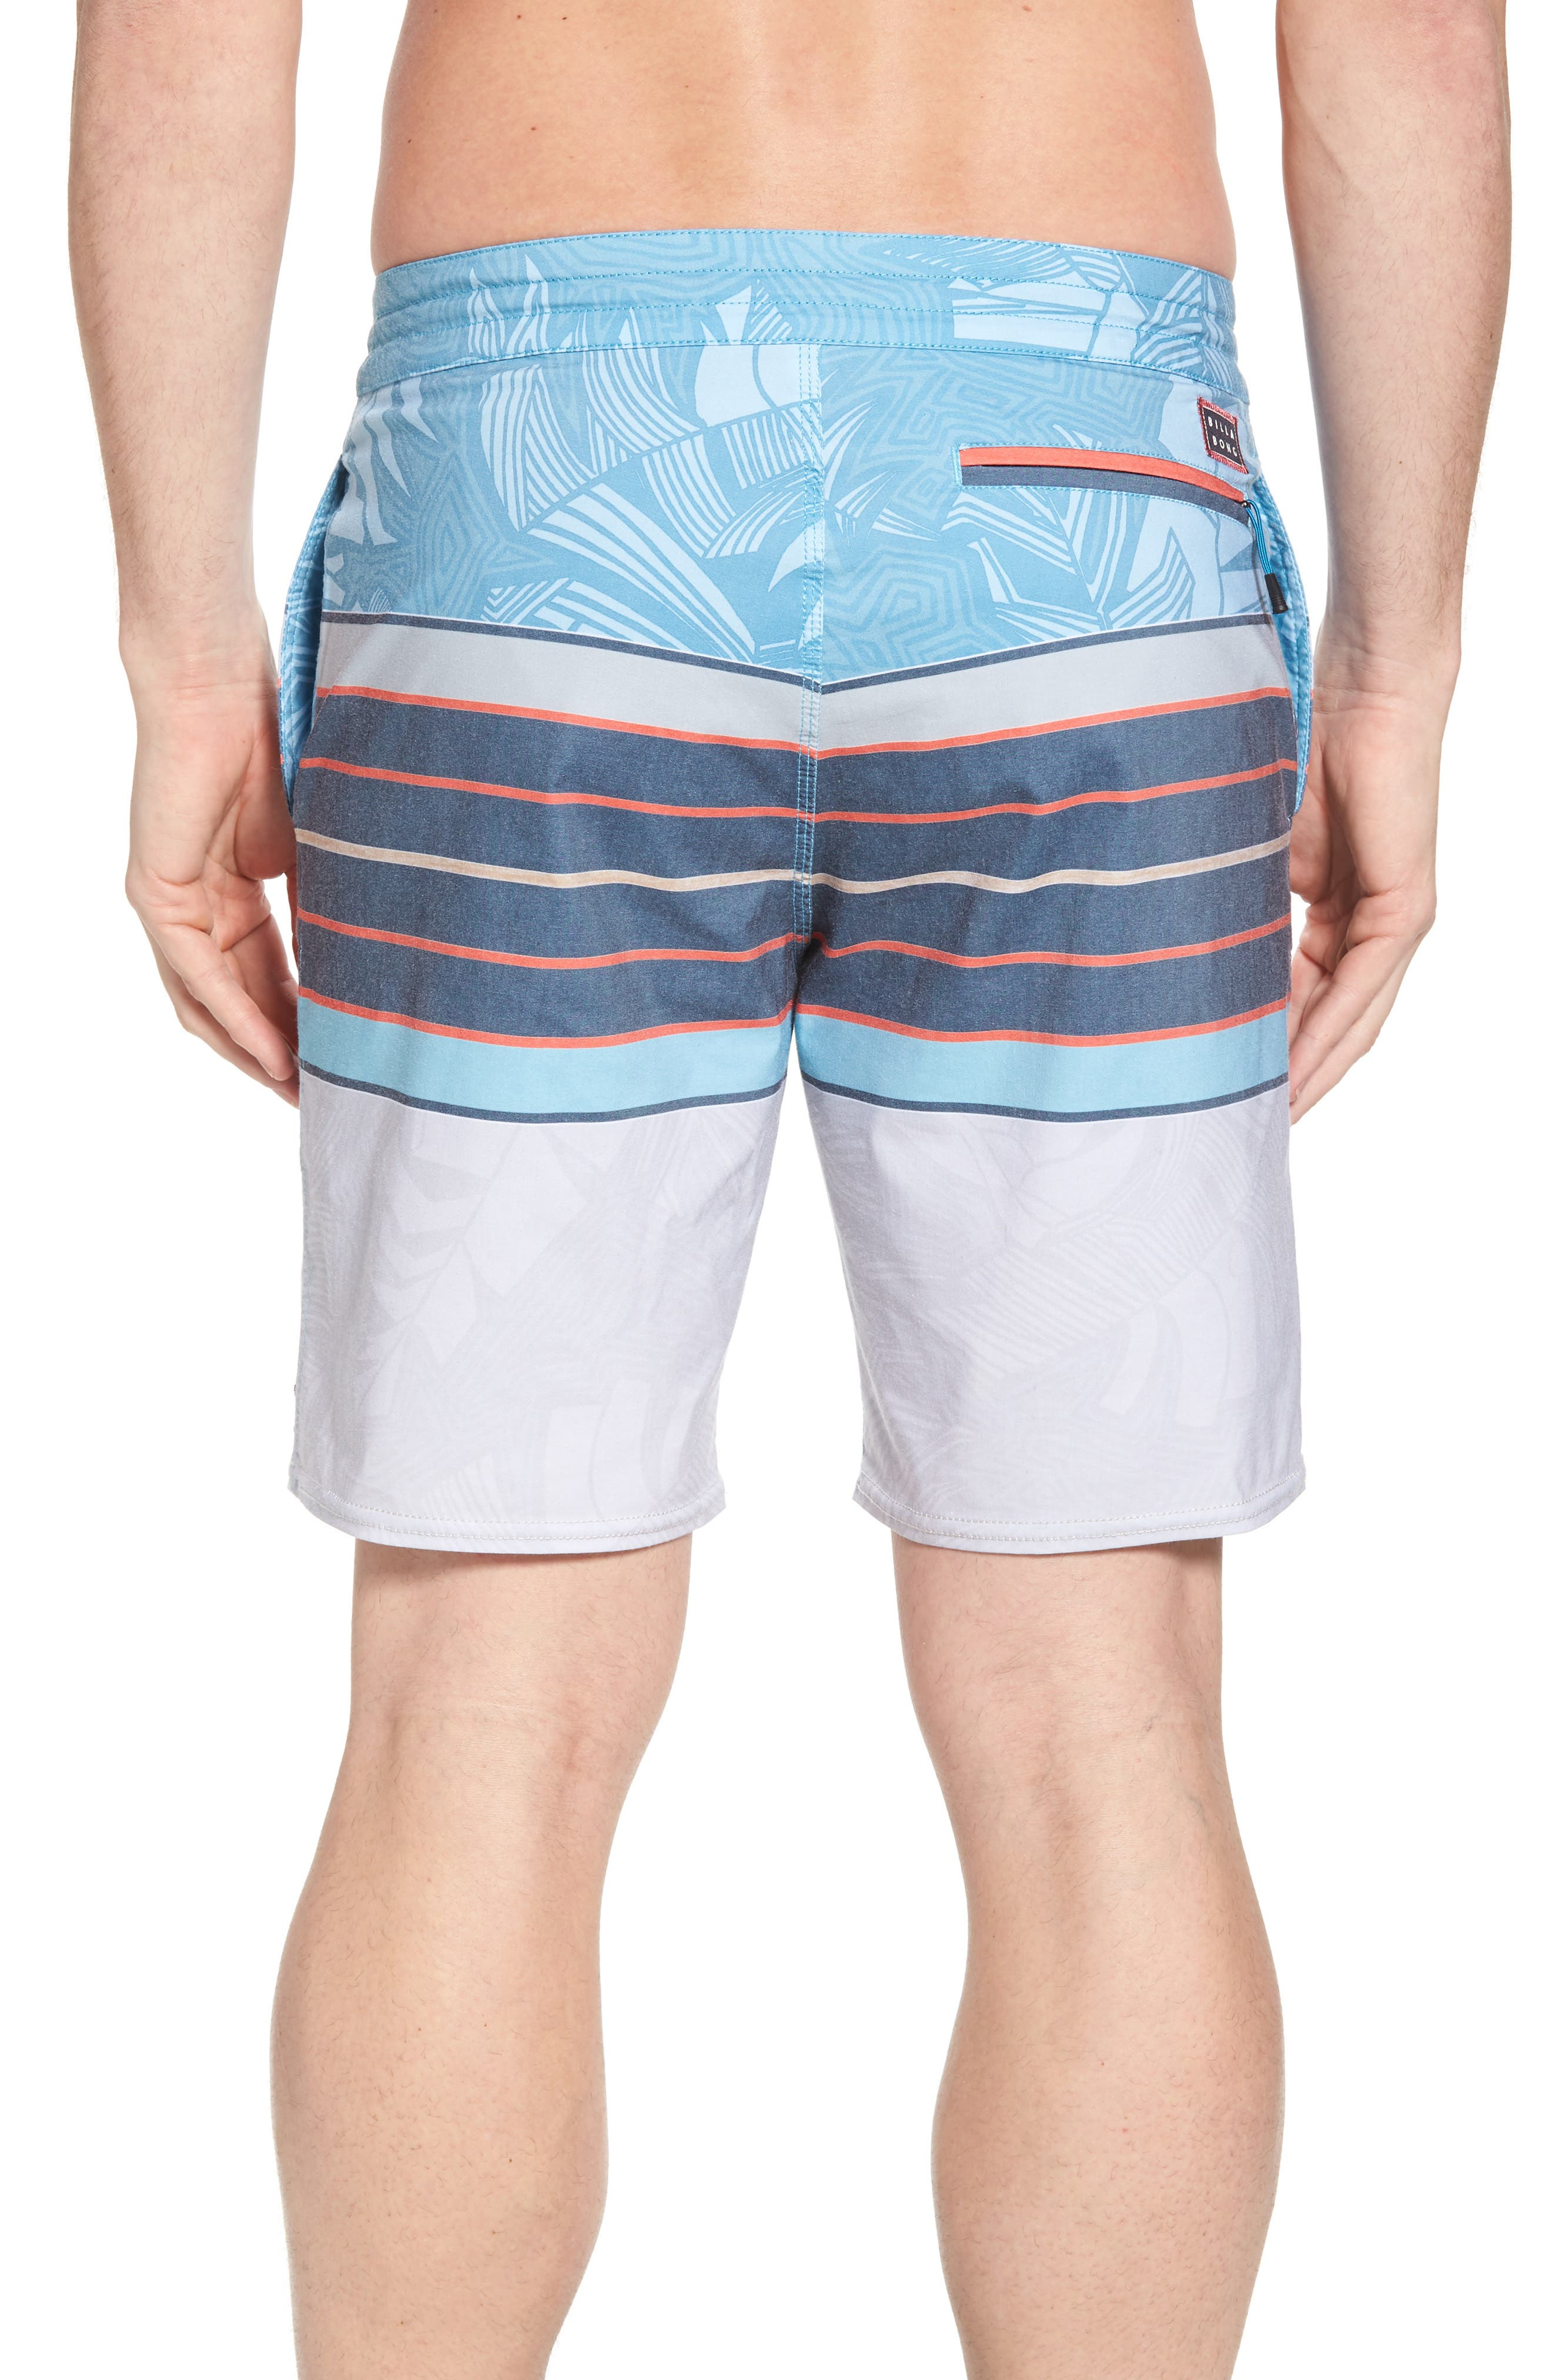 Stringer Lo Tides Board Shorts,                             Alternate thumbnail 2, color,                             Blue